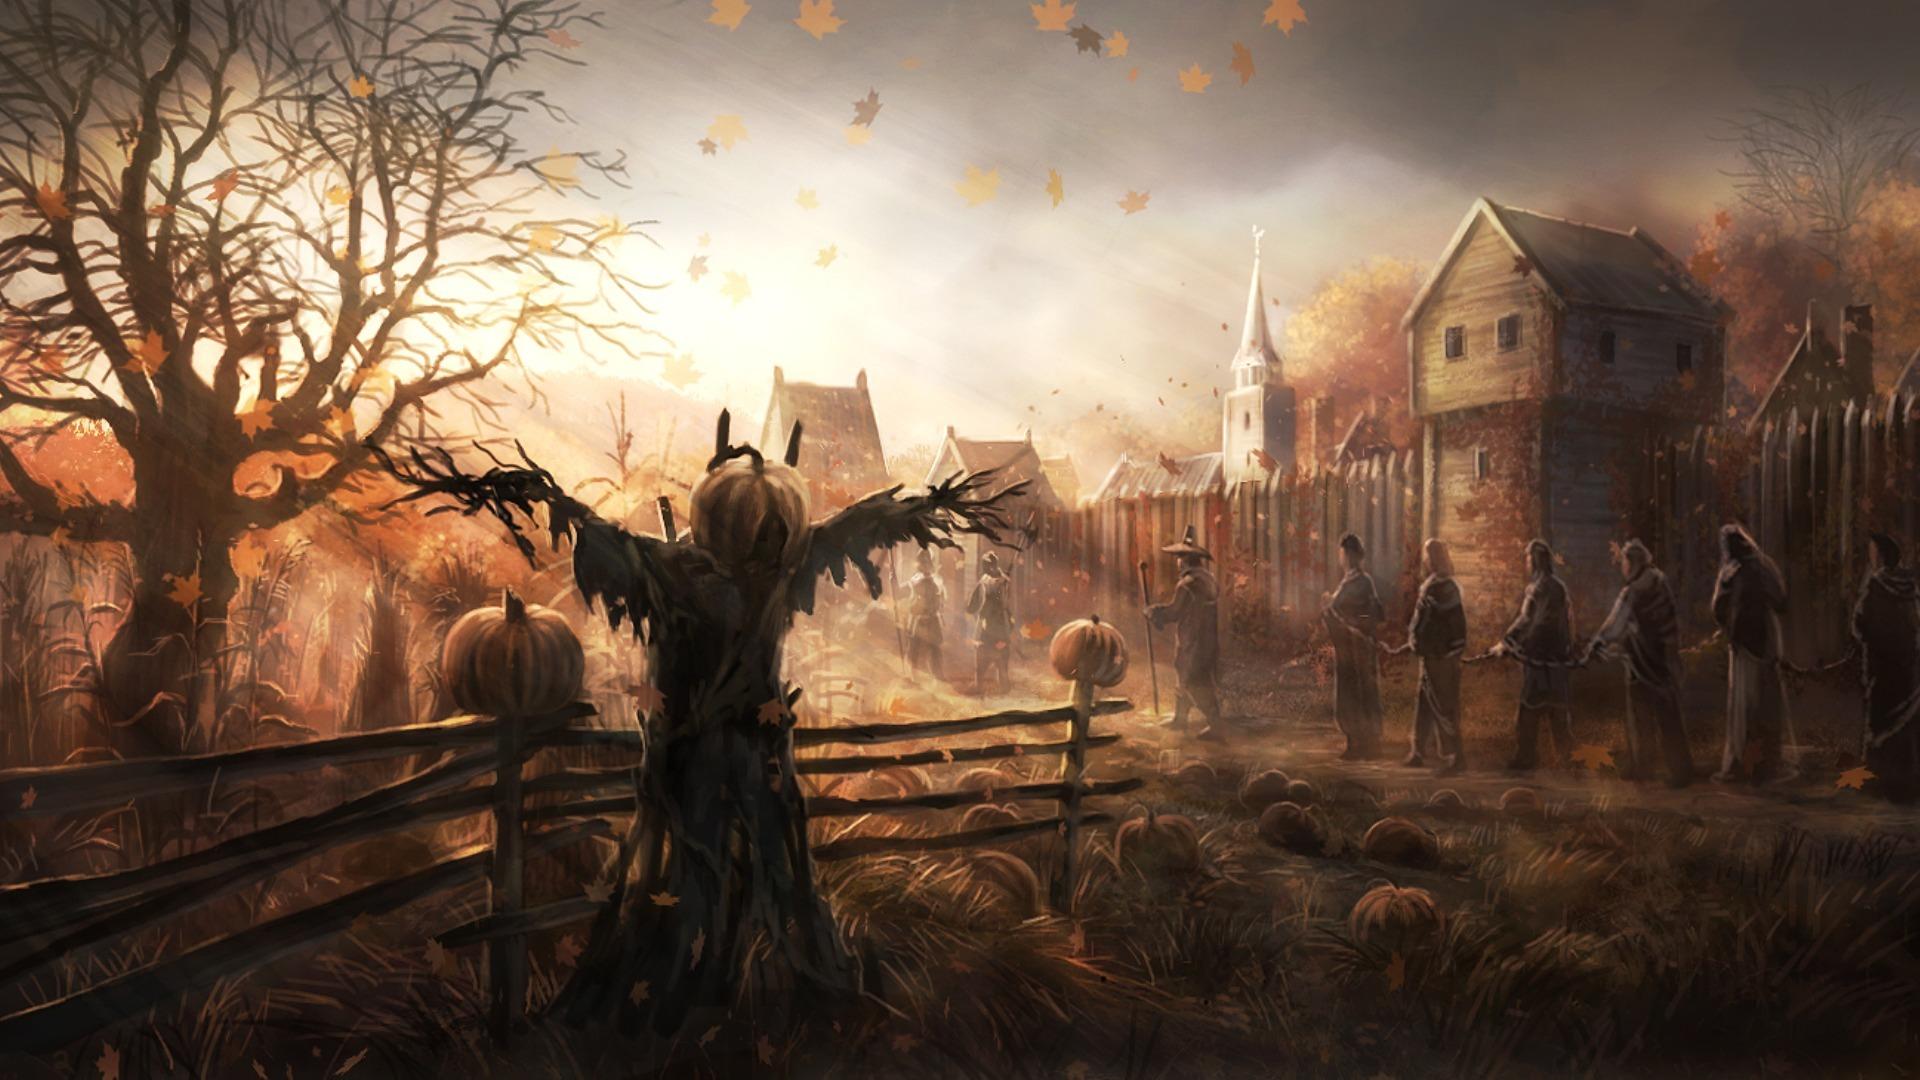 1920x1080 hd halloween wallpaper - photo #28